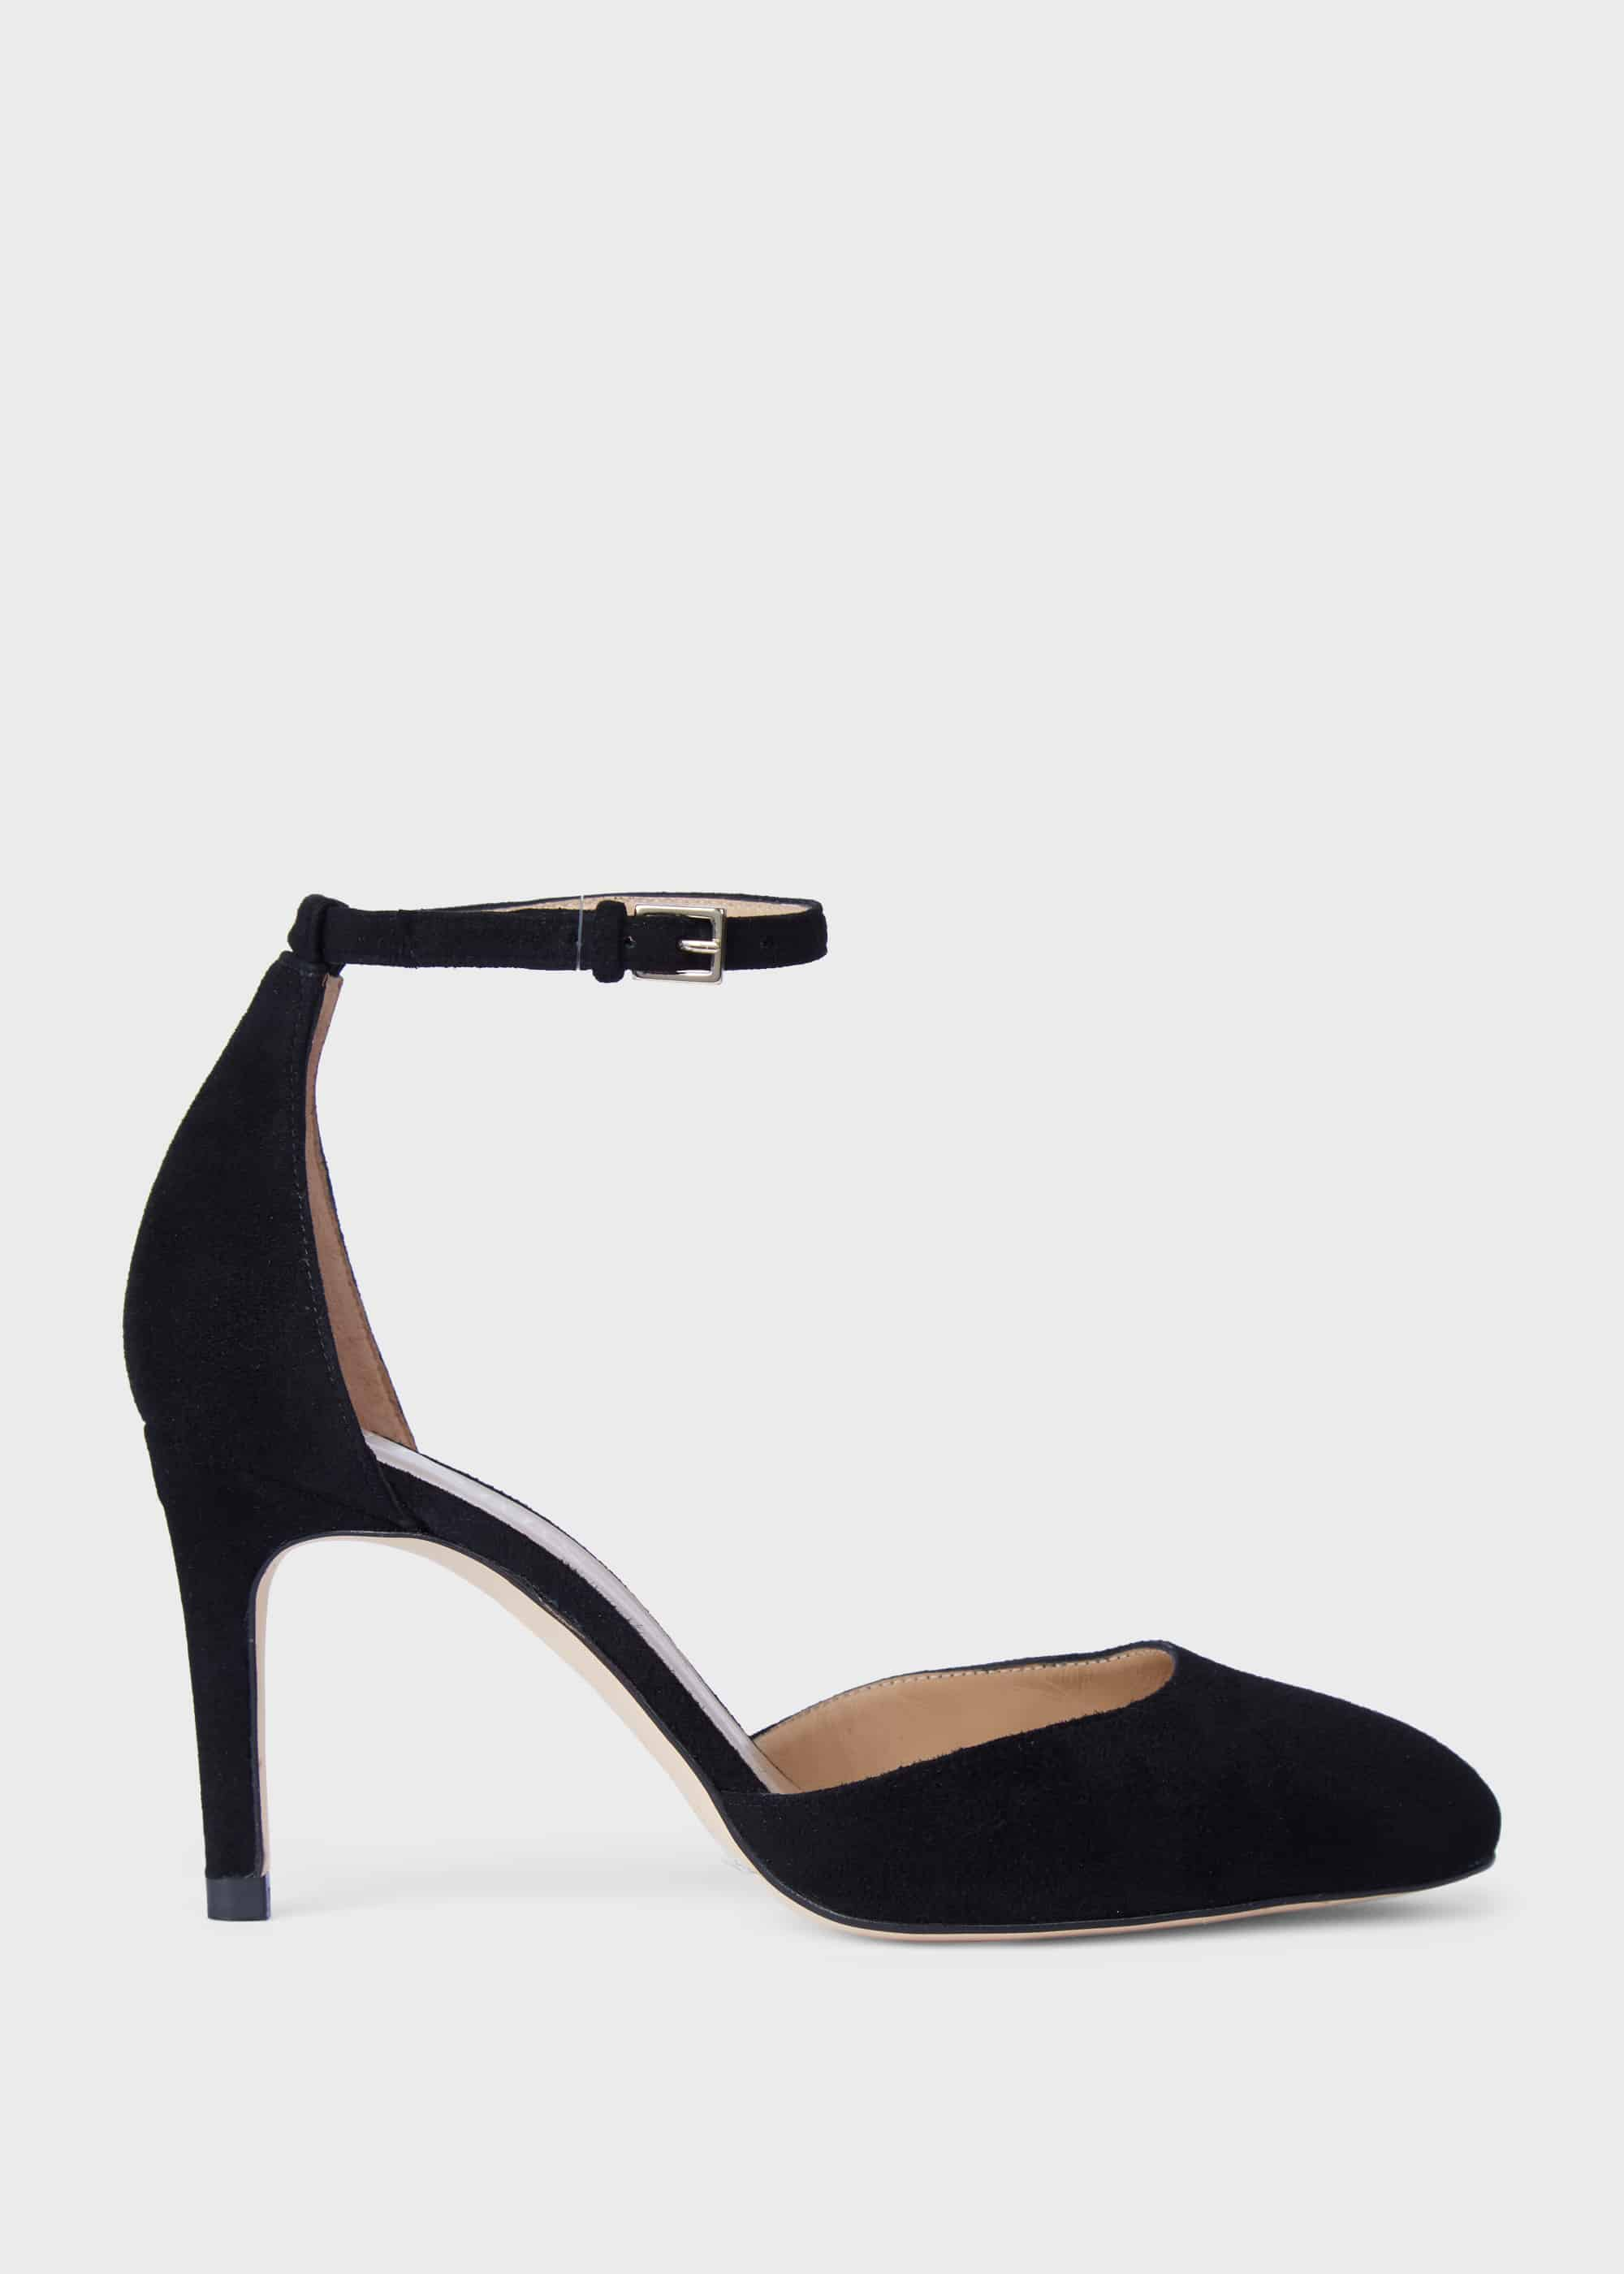 Hobbs Women Elliya Suede Court Shoes